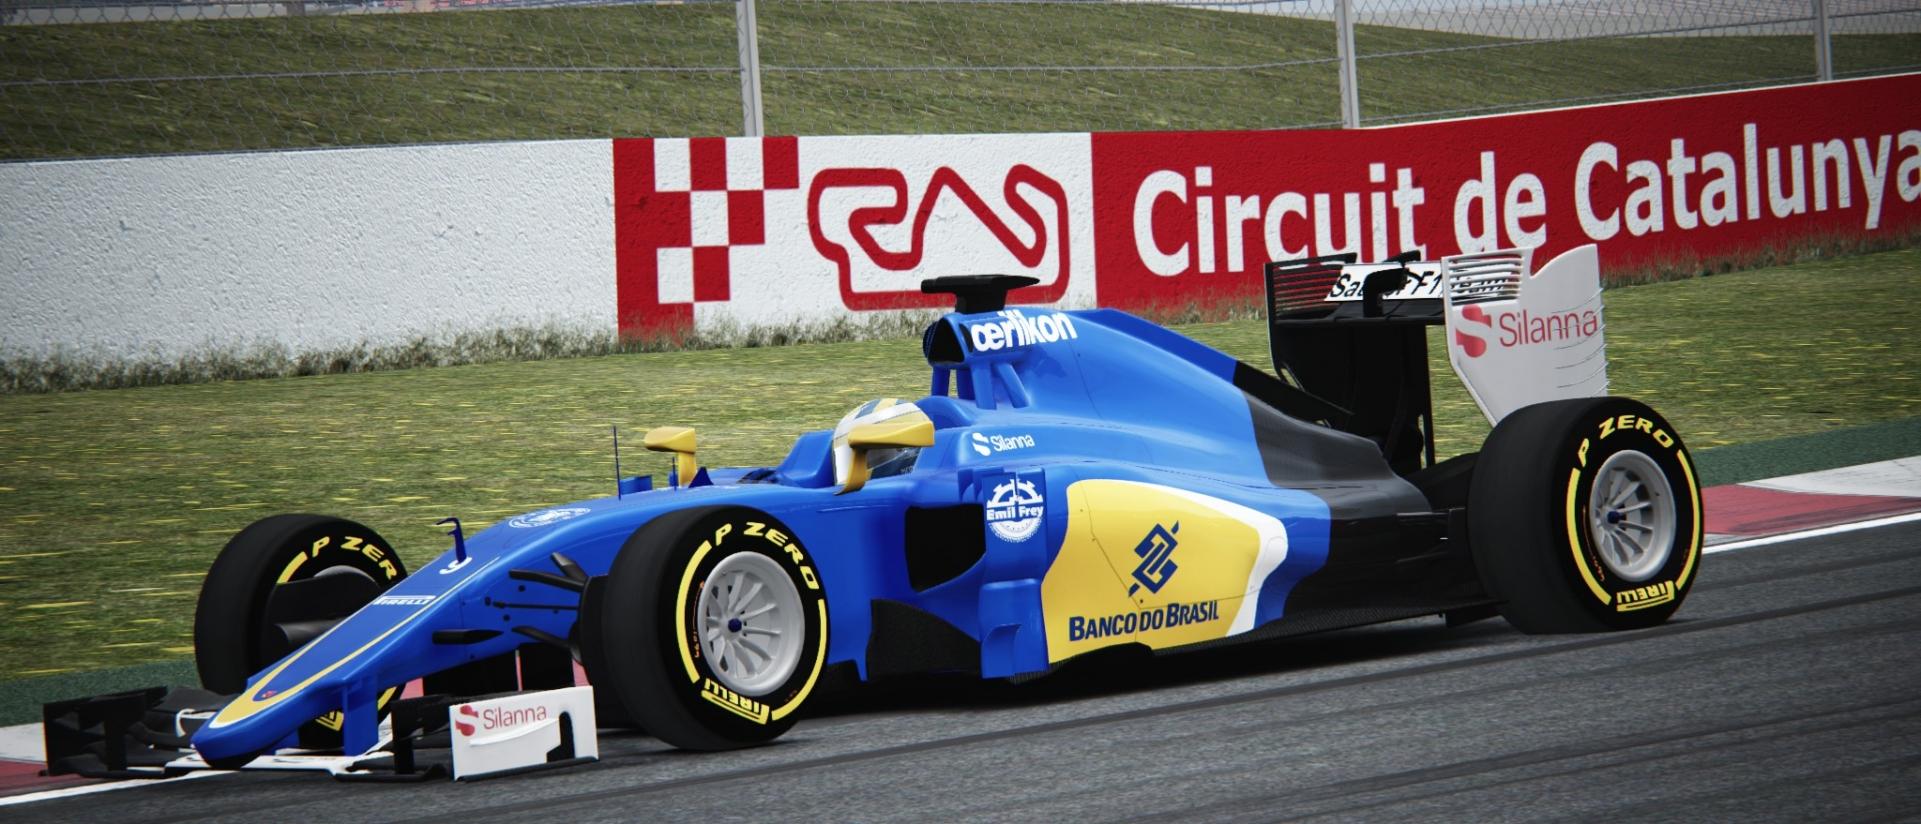 Assetto Corsa - ACFL F1 2015 Catalunya 09